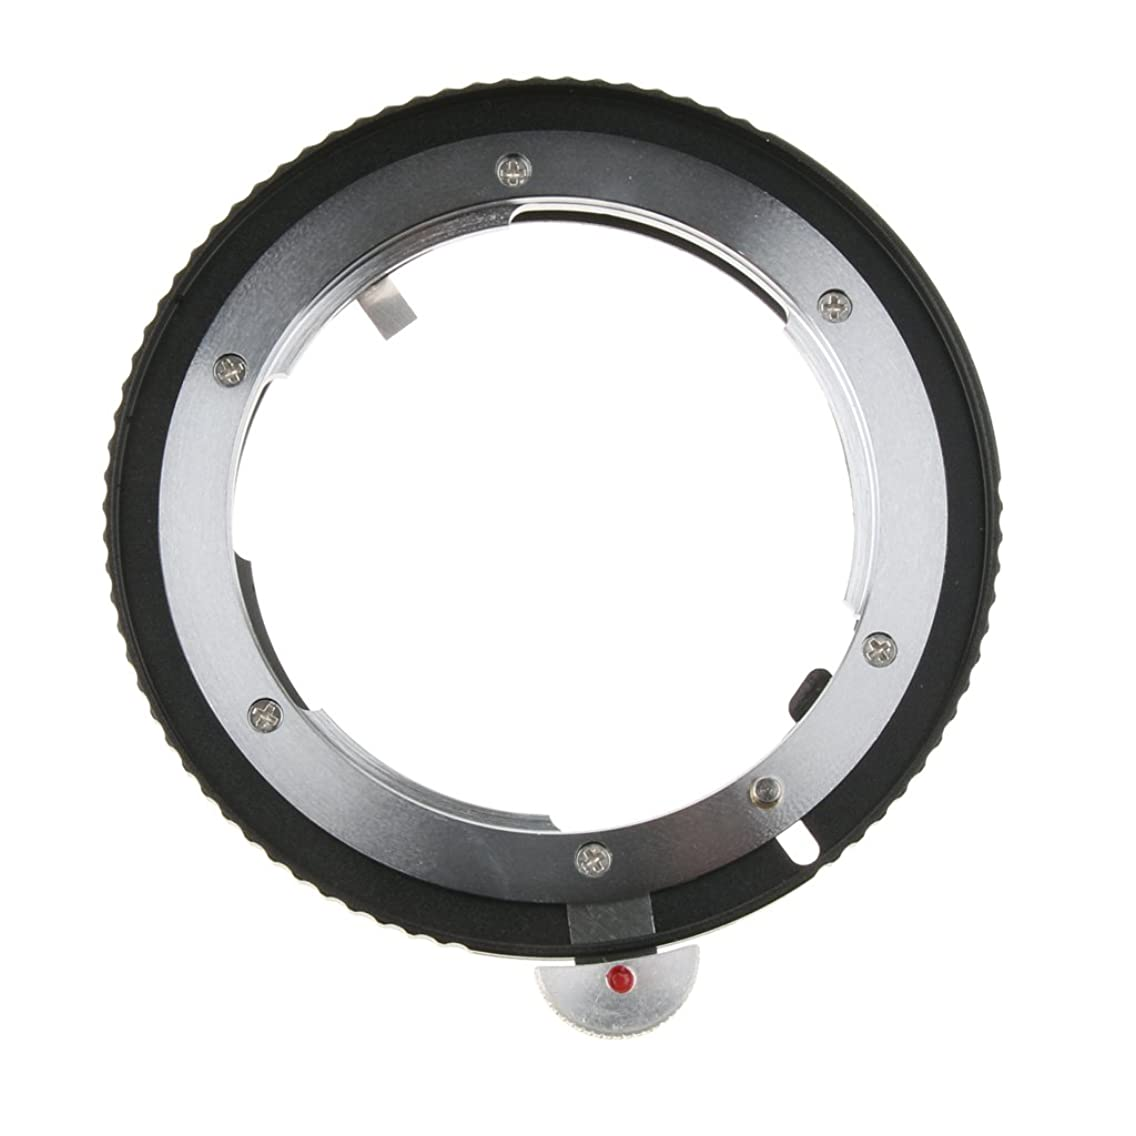 Prettyia Lens Adapter Ring for Nikon G to Canon EOS 1D, 5D, 5Ds, 6D, 7D Mark II/III/IV, 60D, 700D, 750D, 800D, 1200D, 1300D